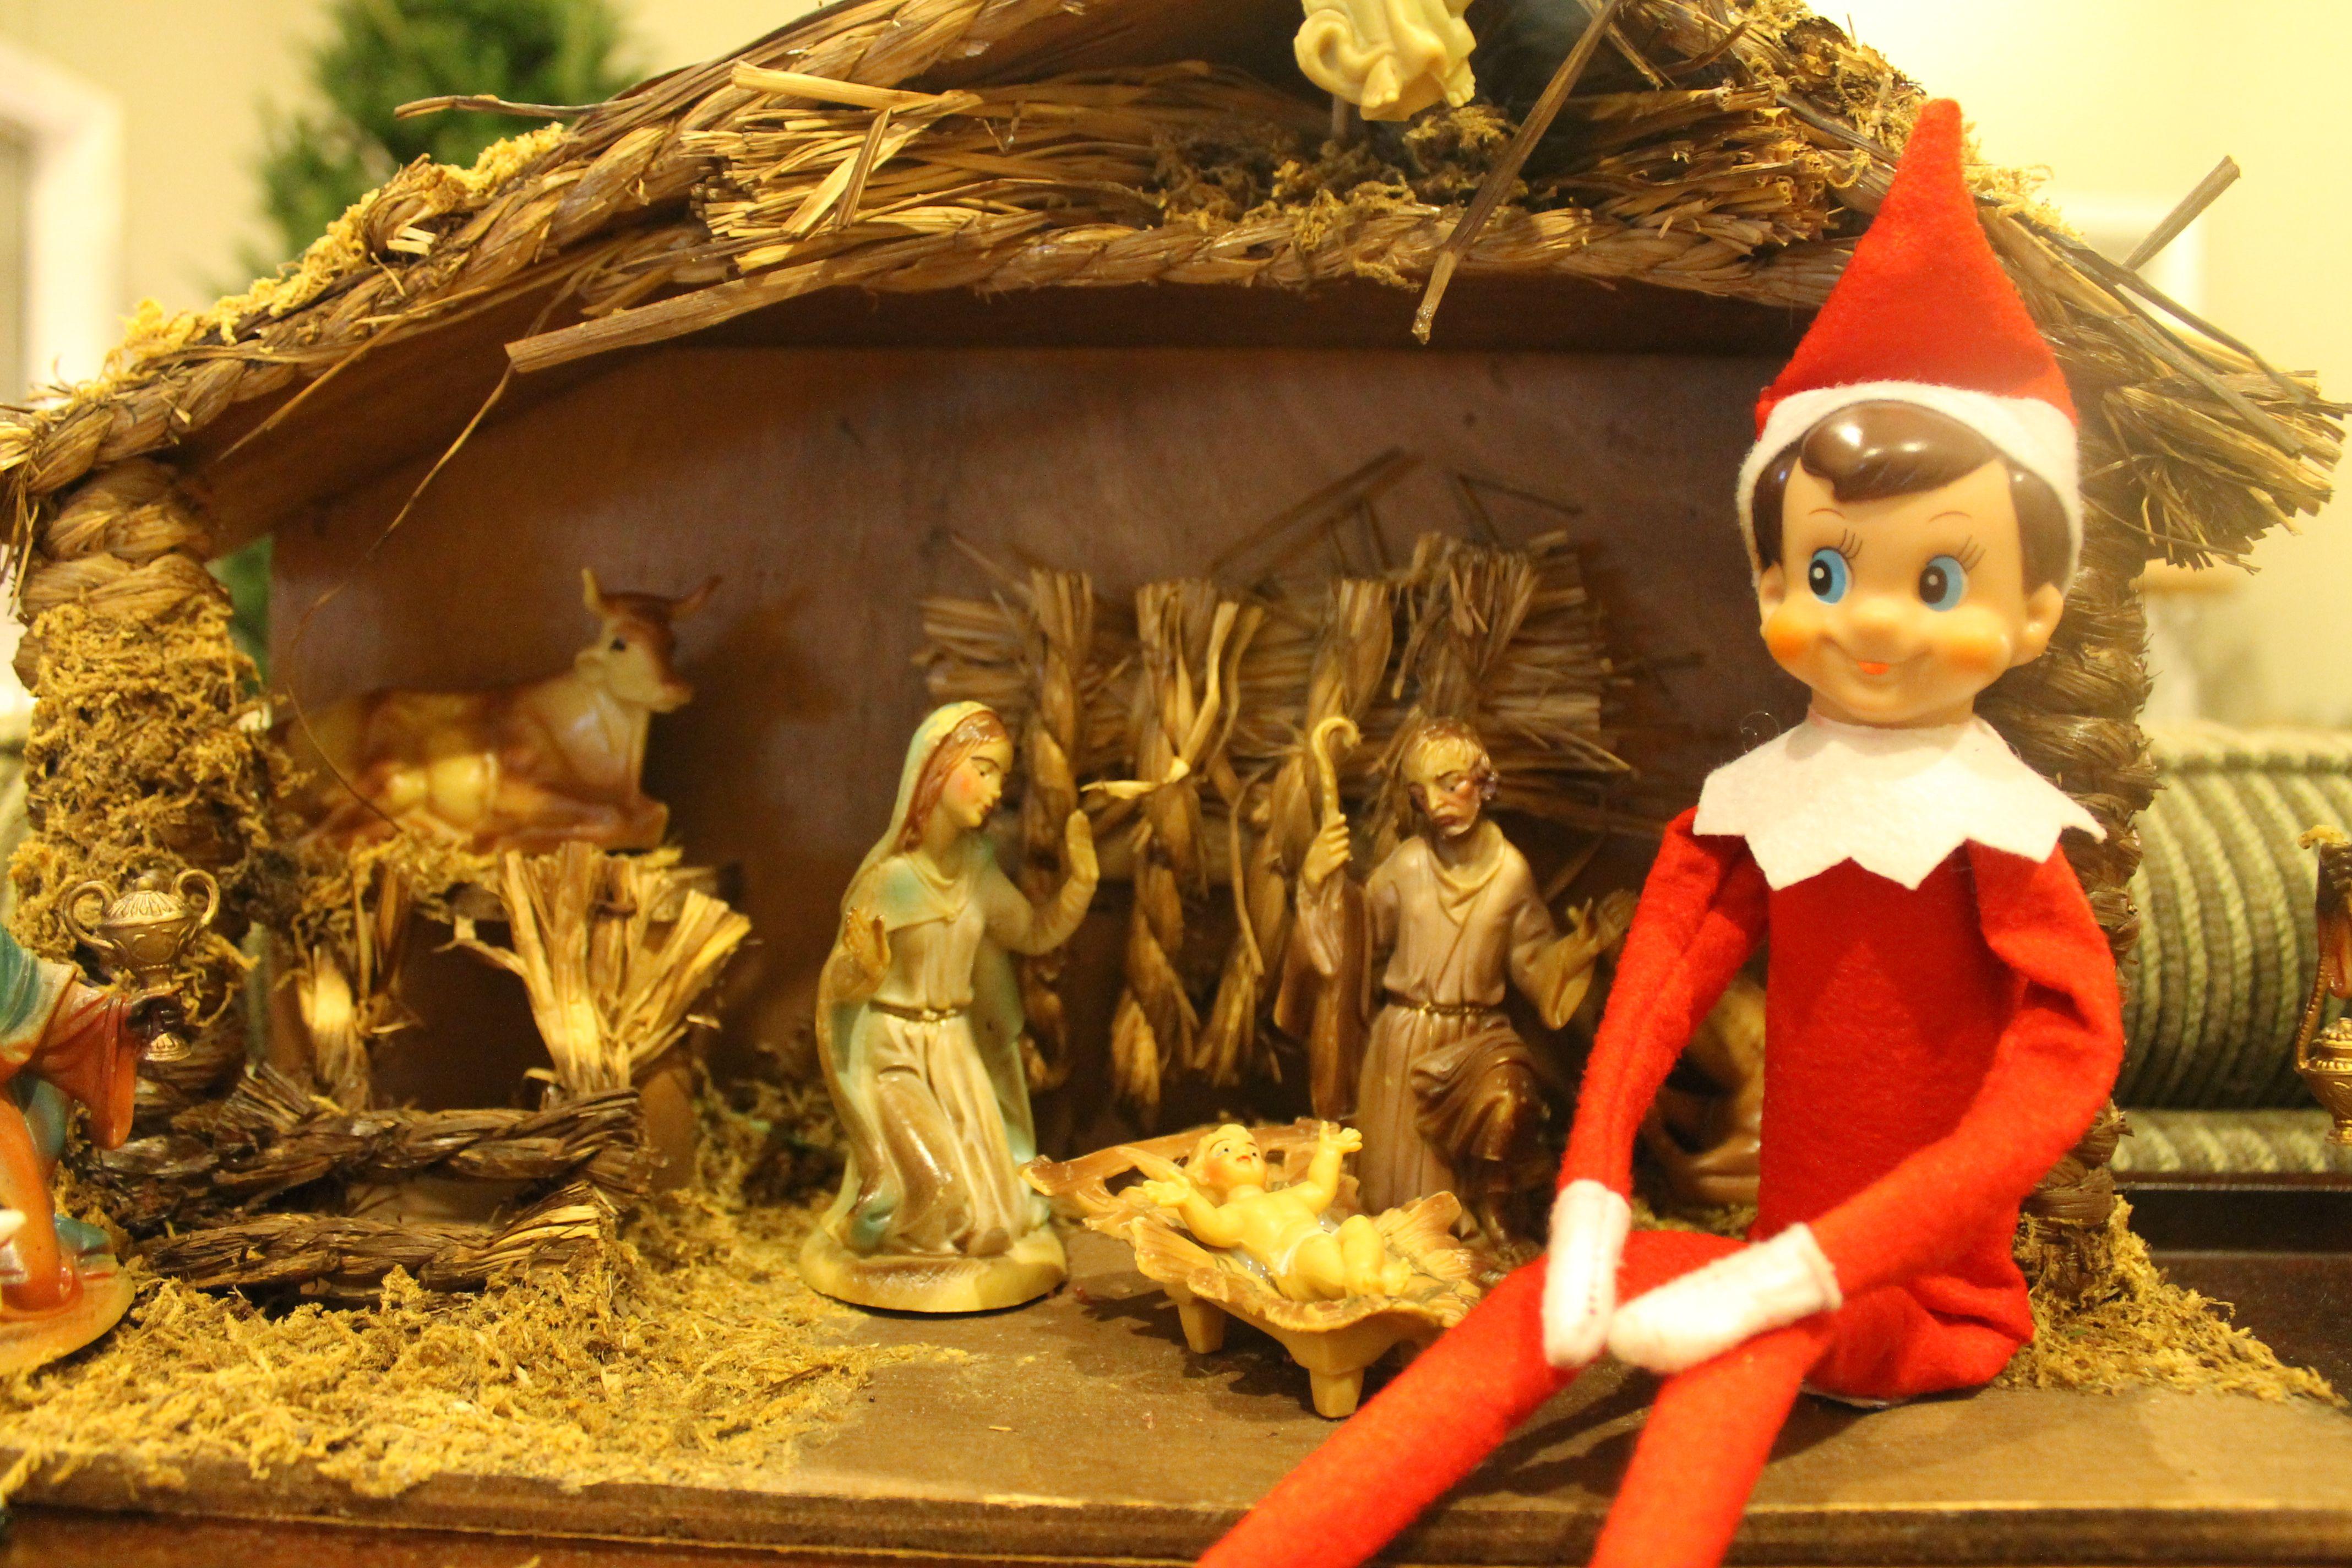 Elf On The Shelf Nativity Elf On The Shelf Elf The Elf